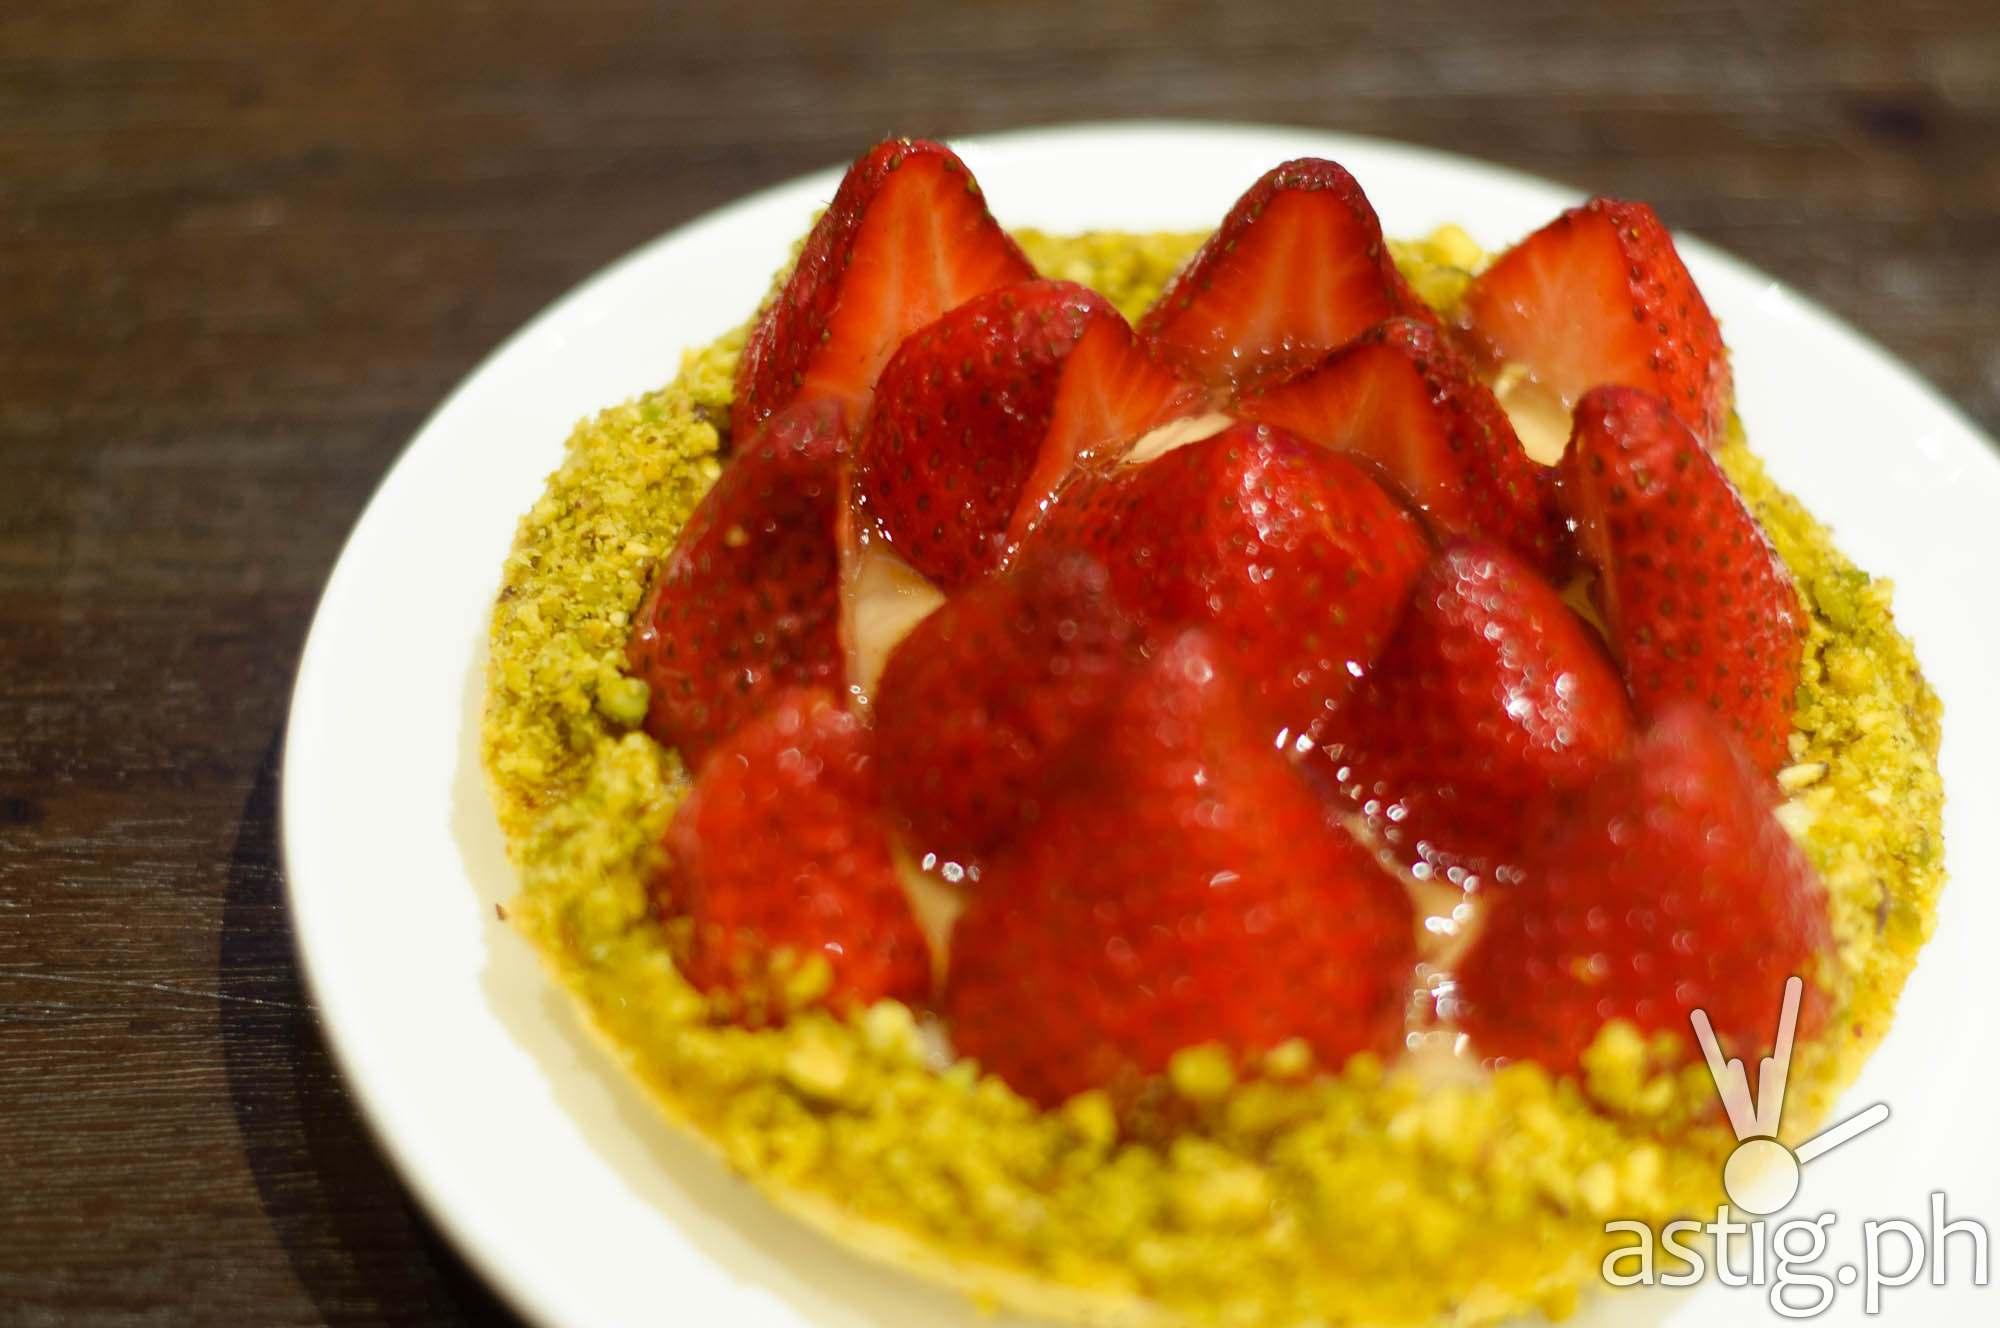 Strawberry Tart (P230) - Crema at Marriott Grand Ballroom